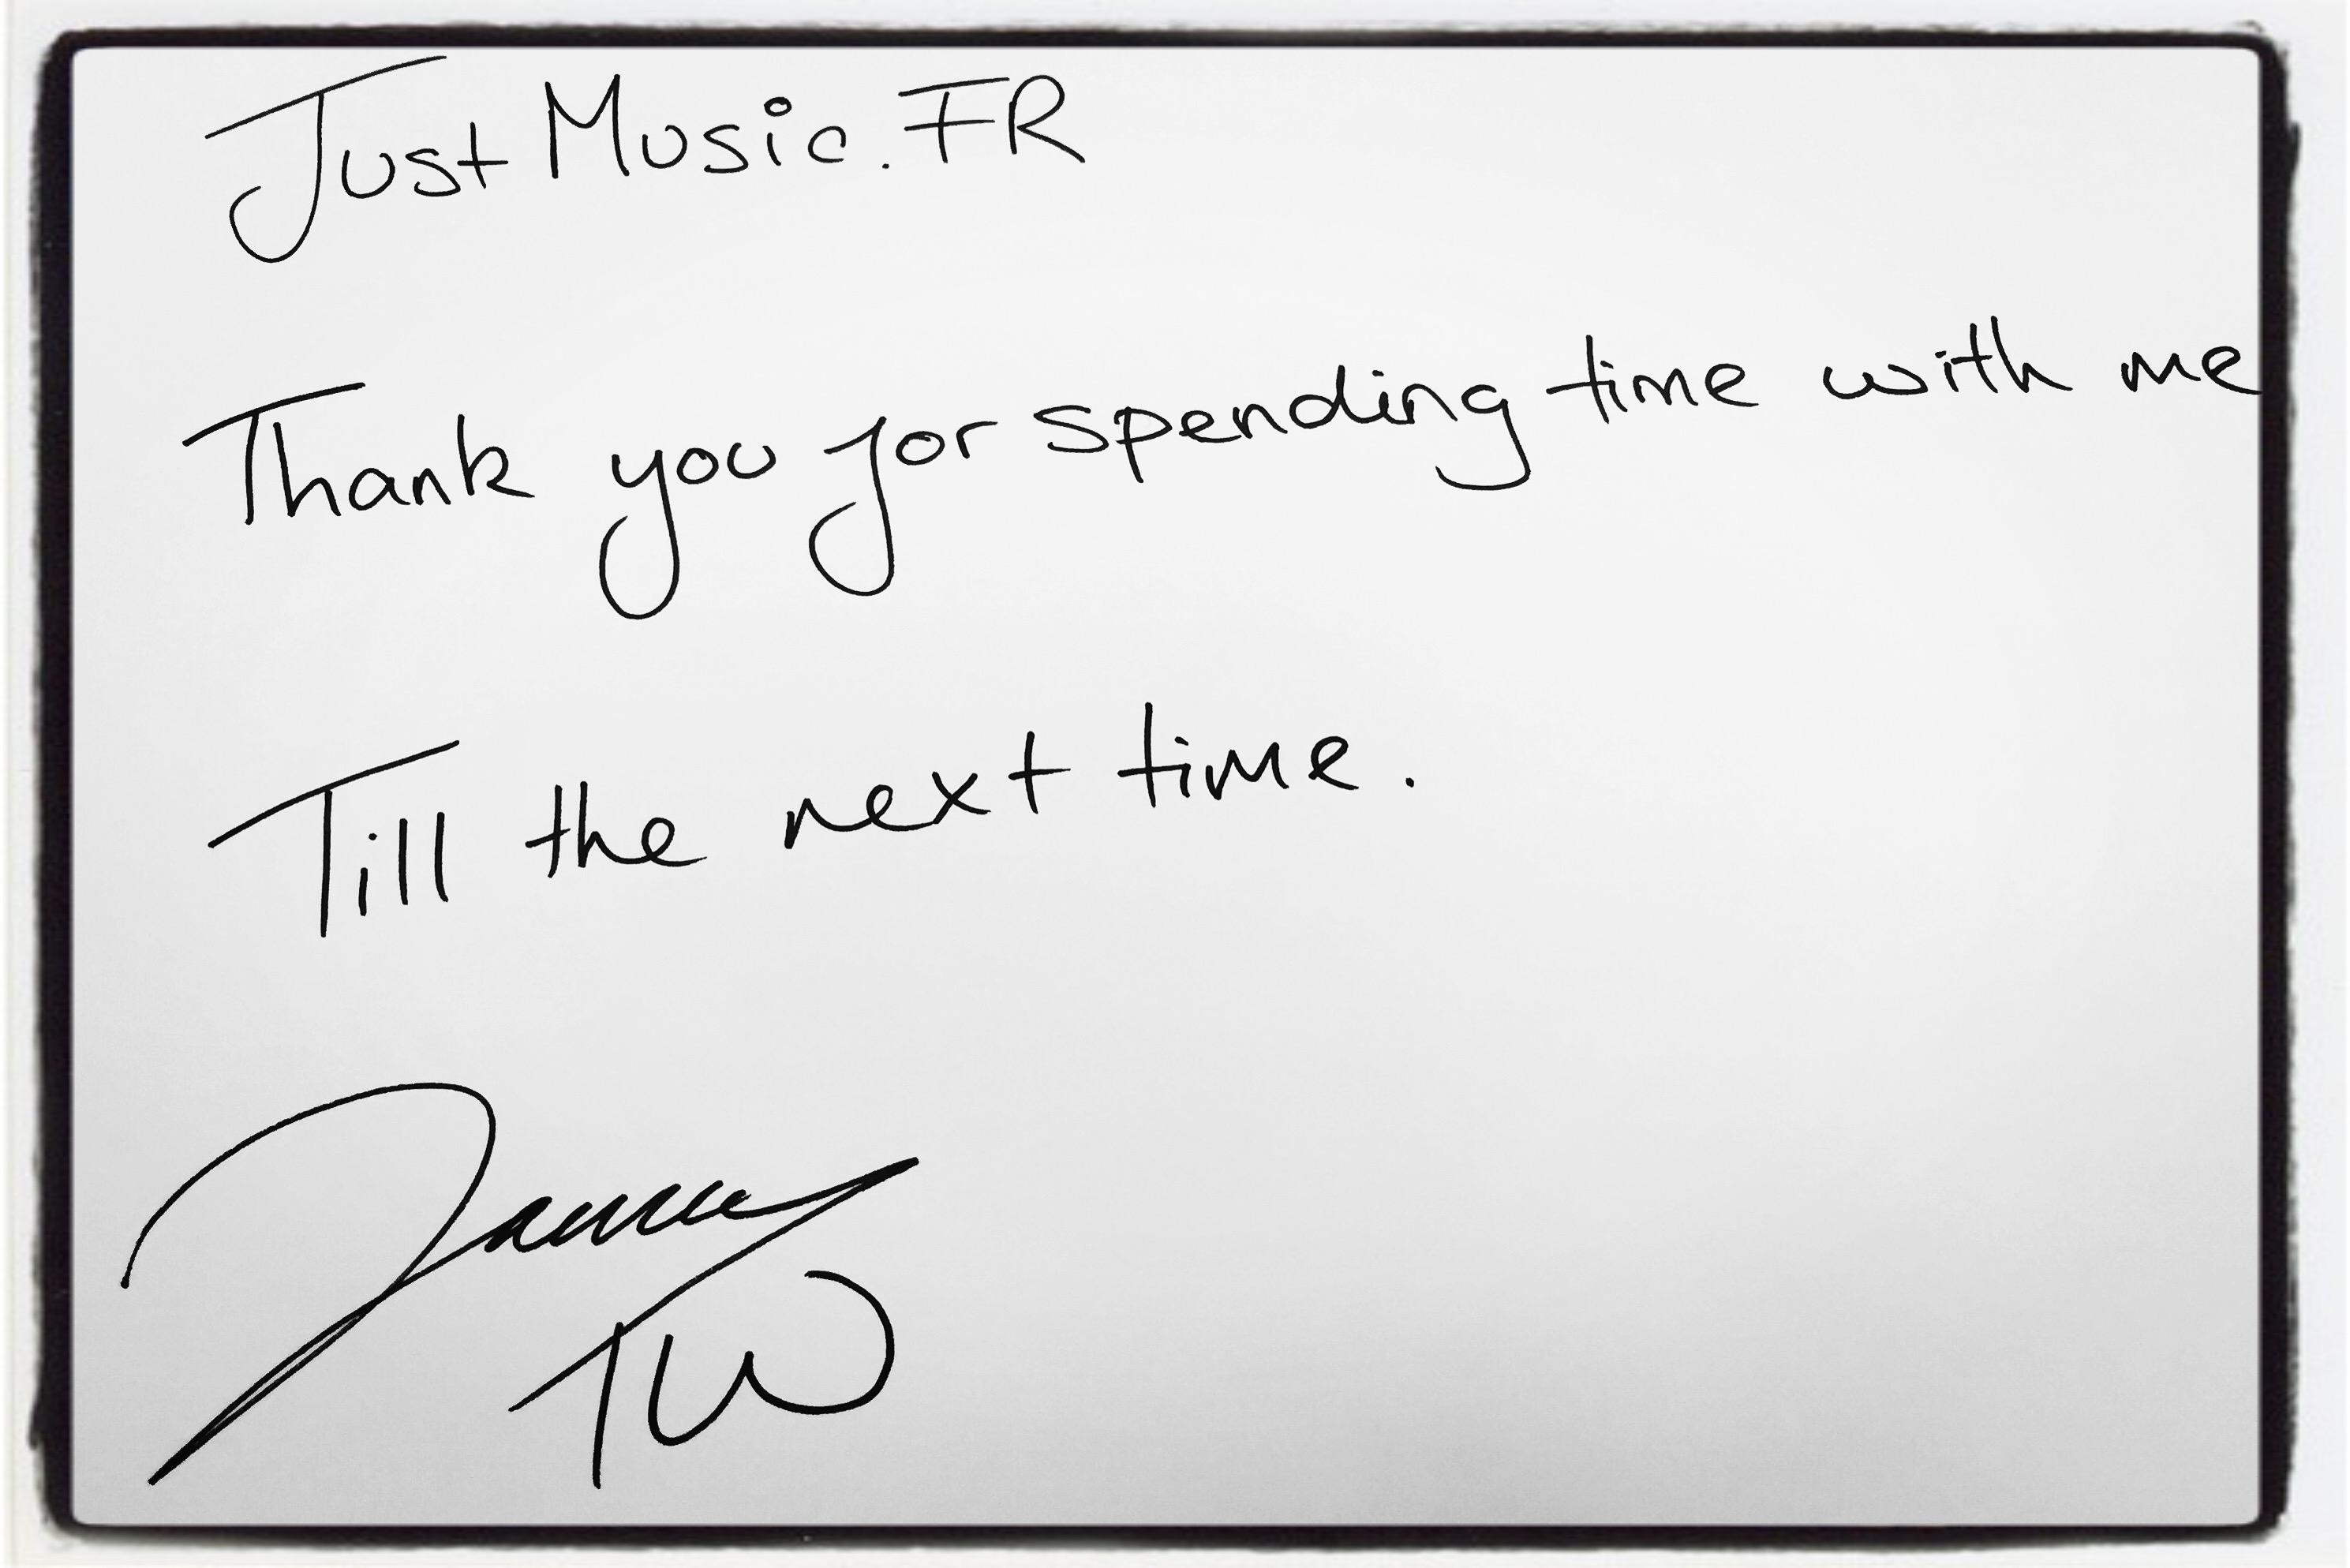 james-tw-justmusic-fr-dedicace